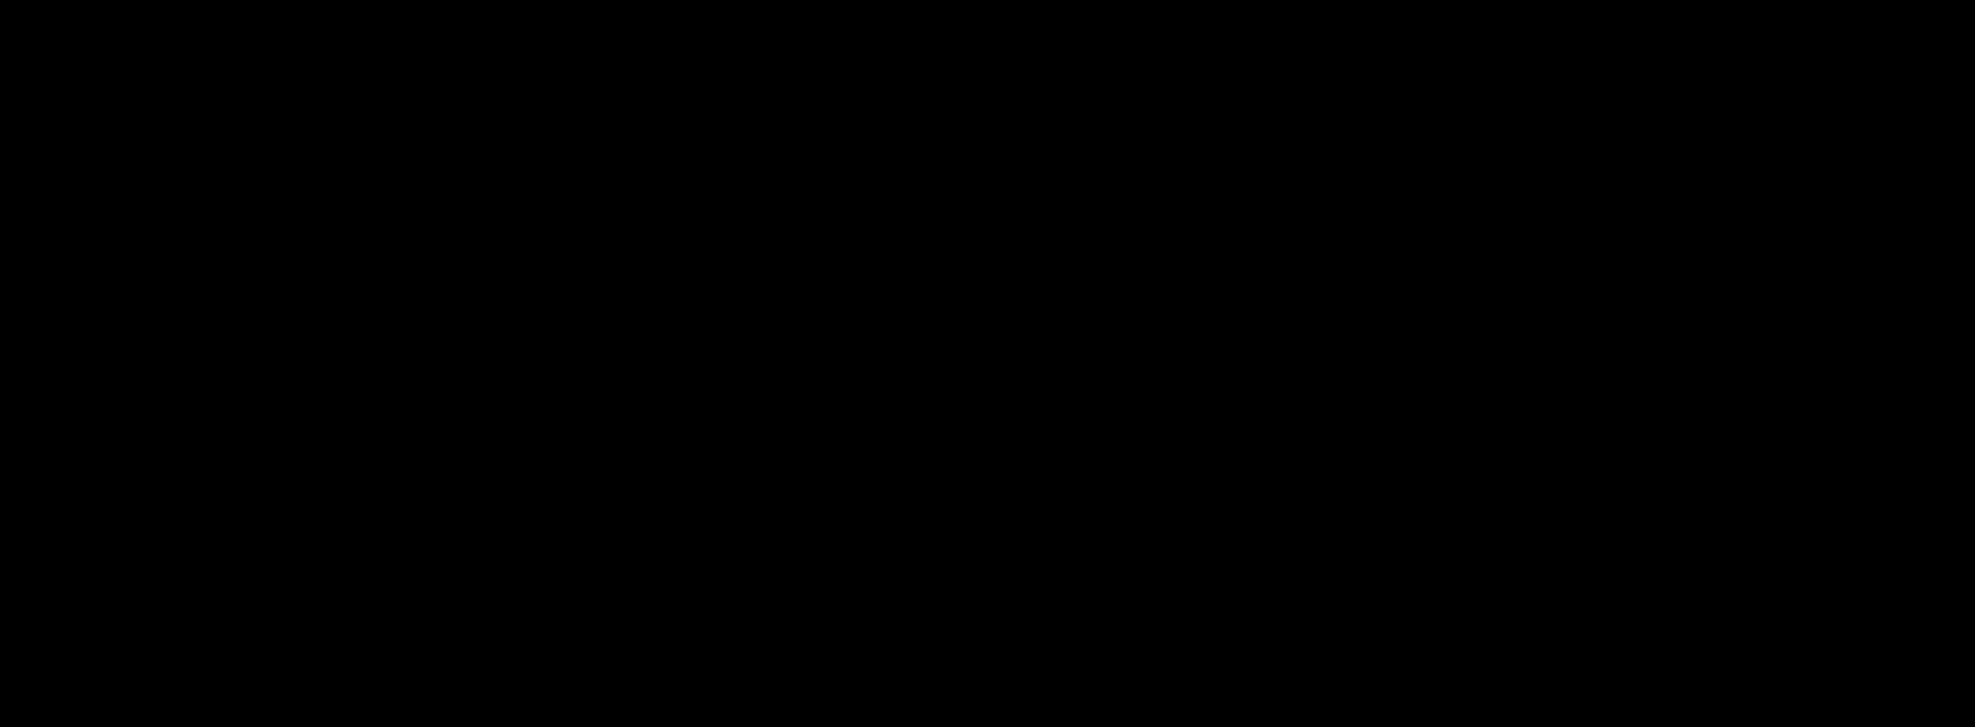 Mqx Rtos